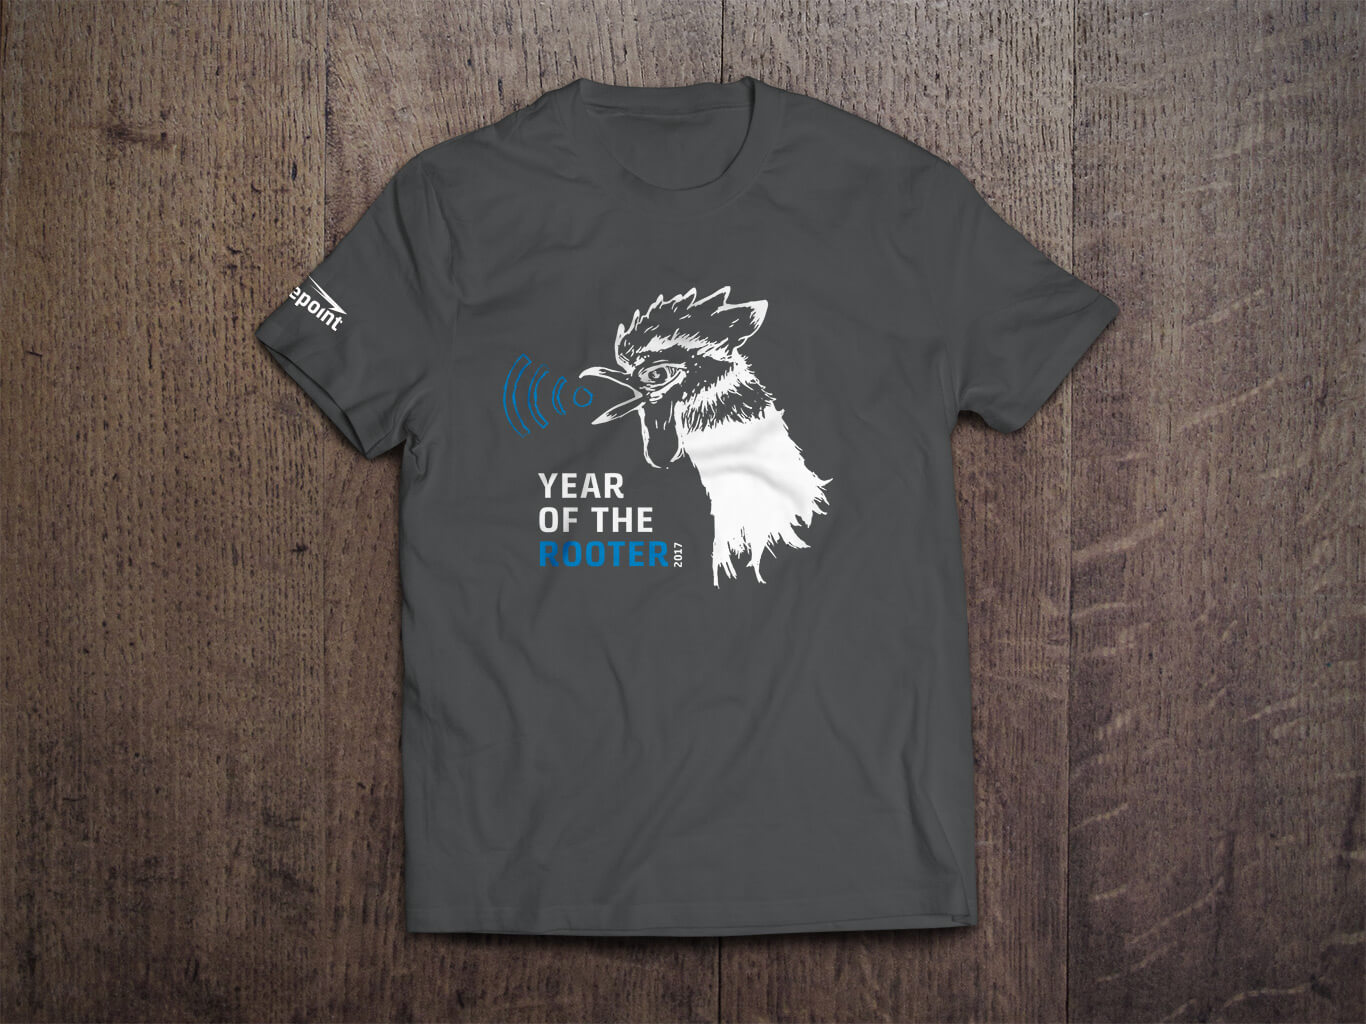 cradlepoint-tshirt-design.jpg